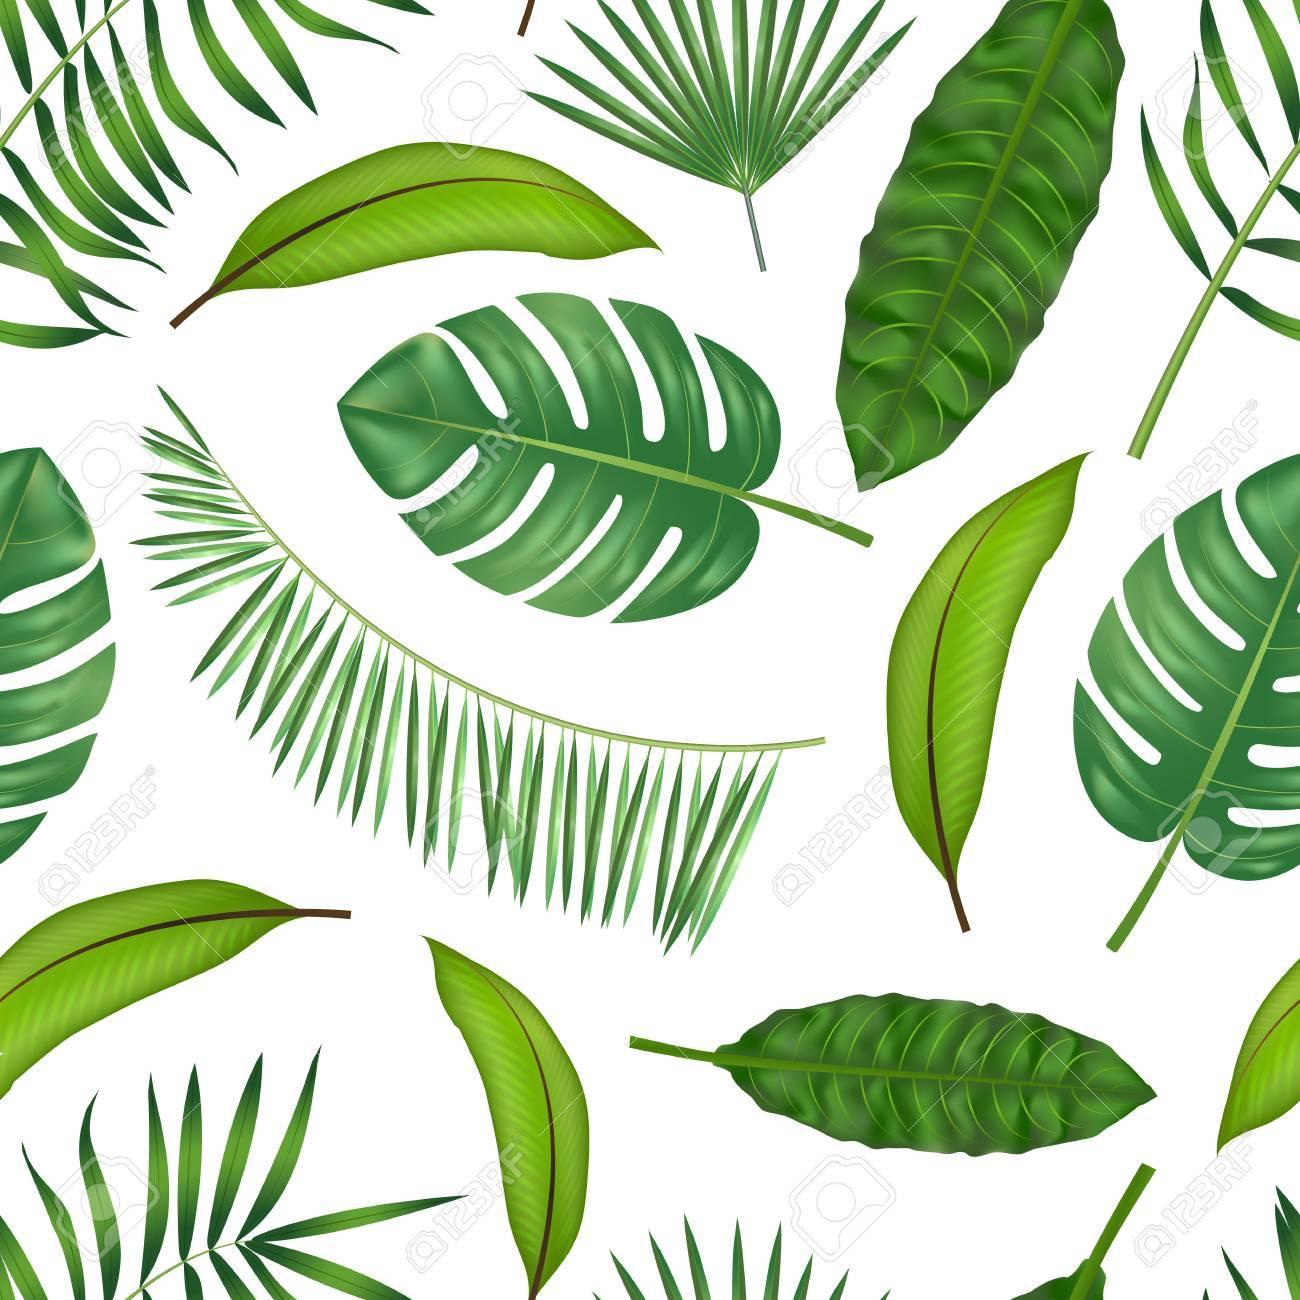 Tropischen Hawaii Lasst Pflanzen Muster Im 3